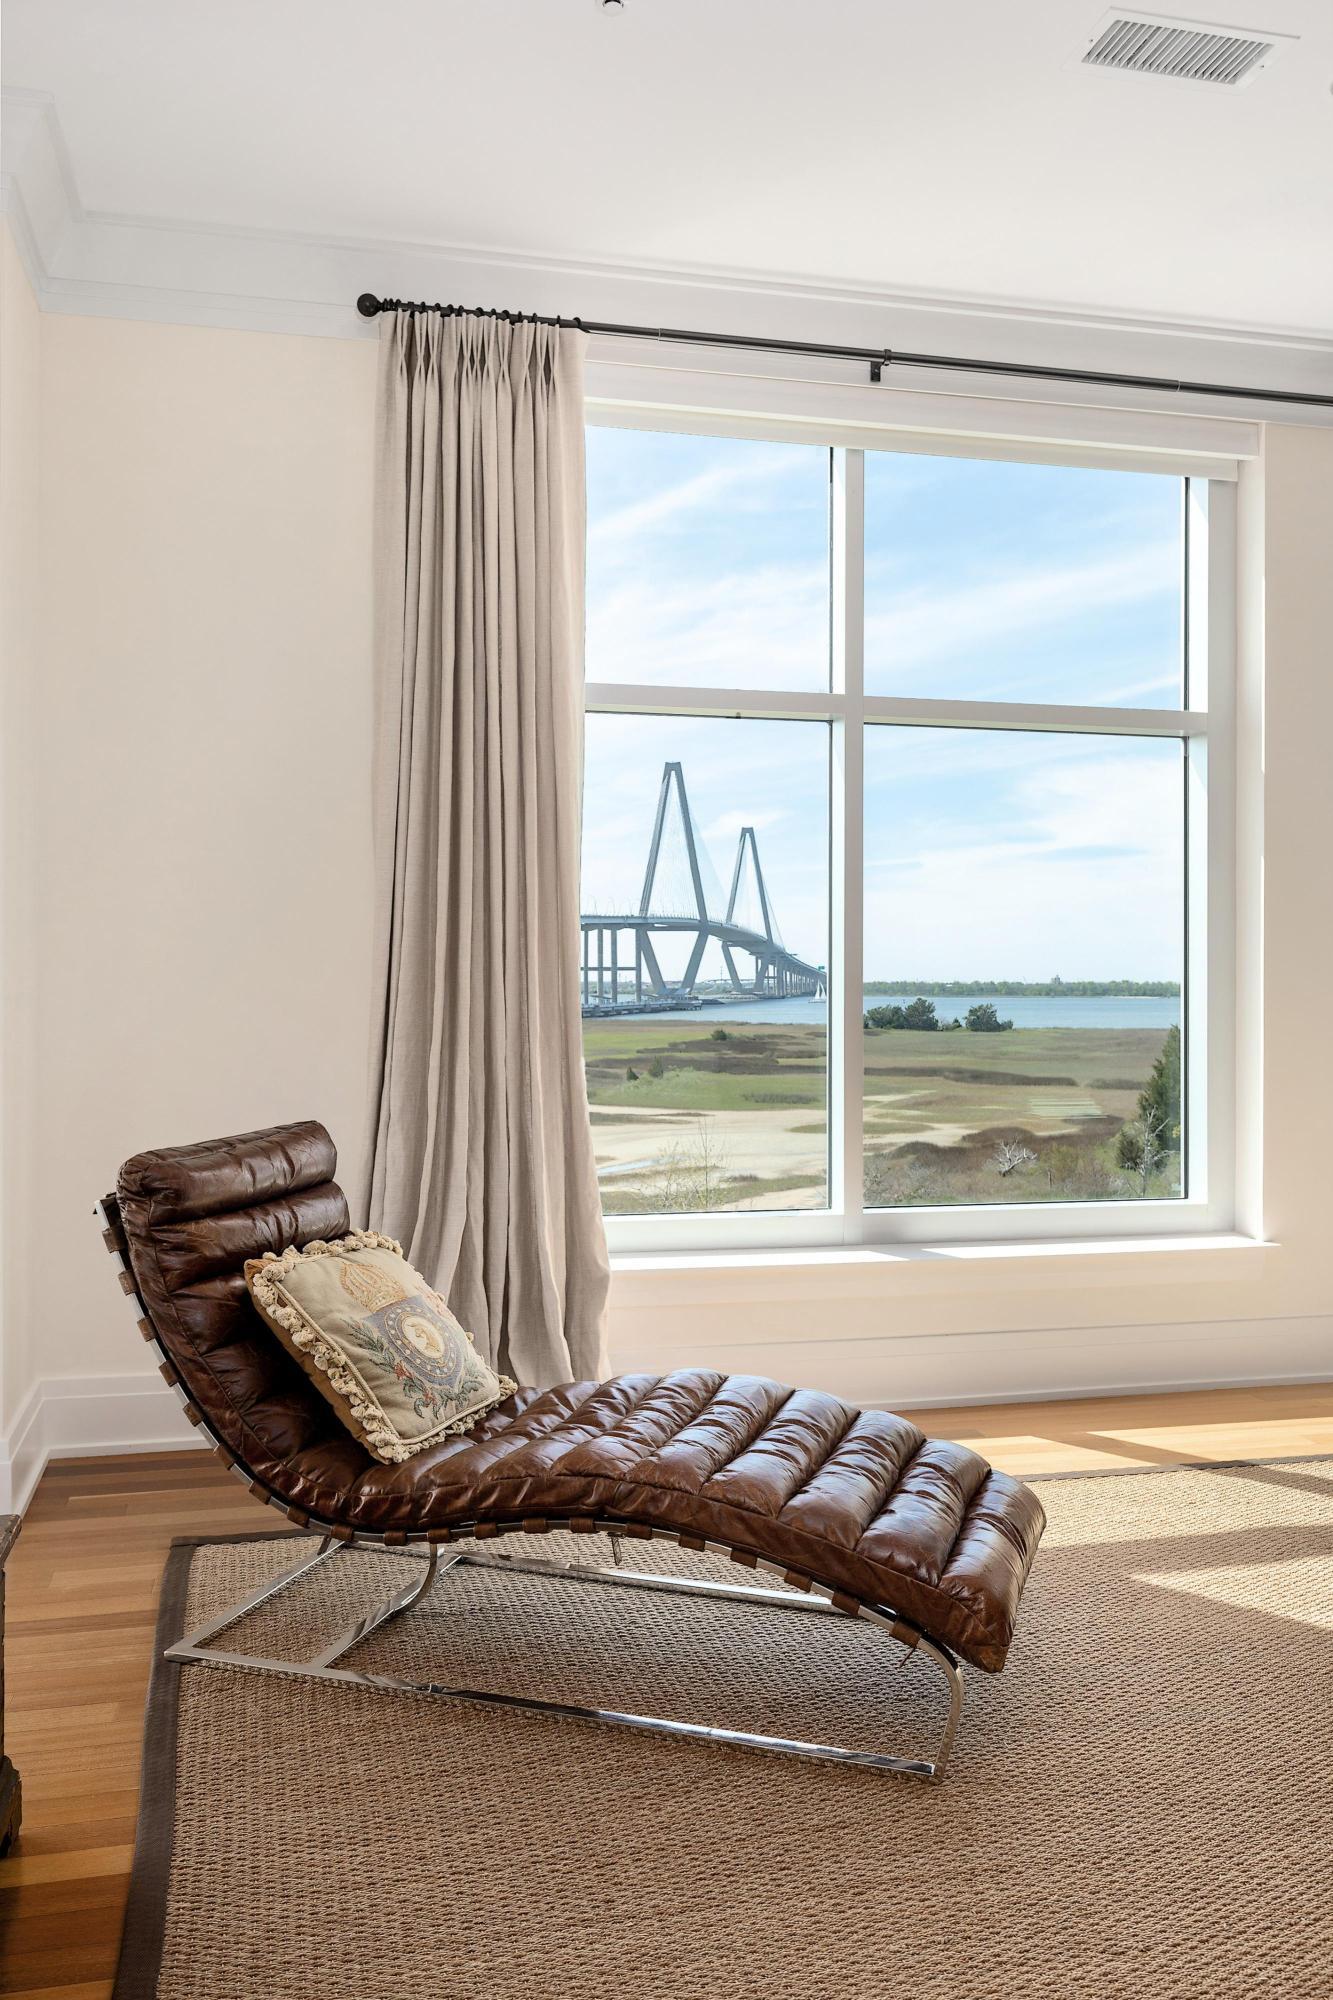 Tides Condominiums Homes For Sale - 231 Cooper River, Mount Pleasant, SC - 28